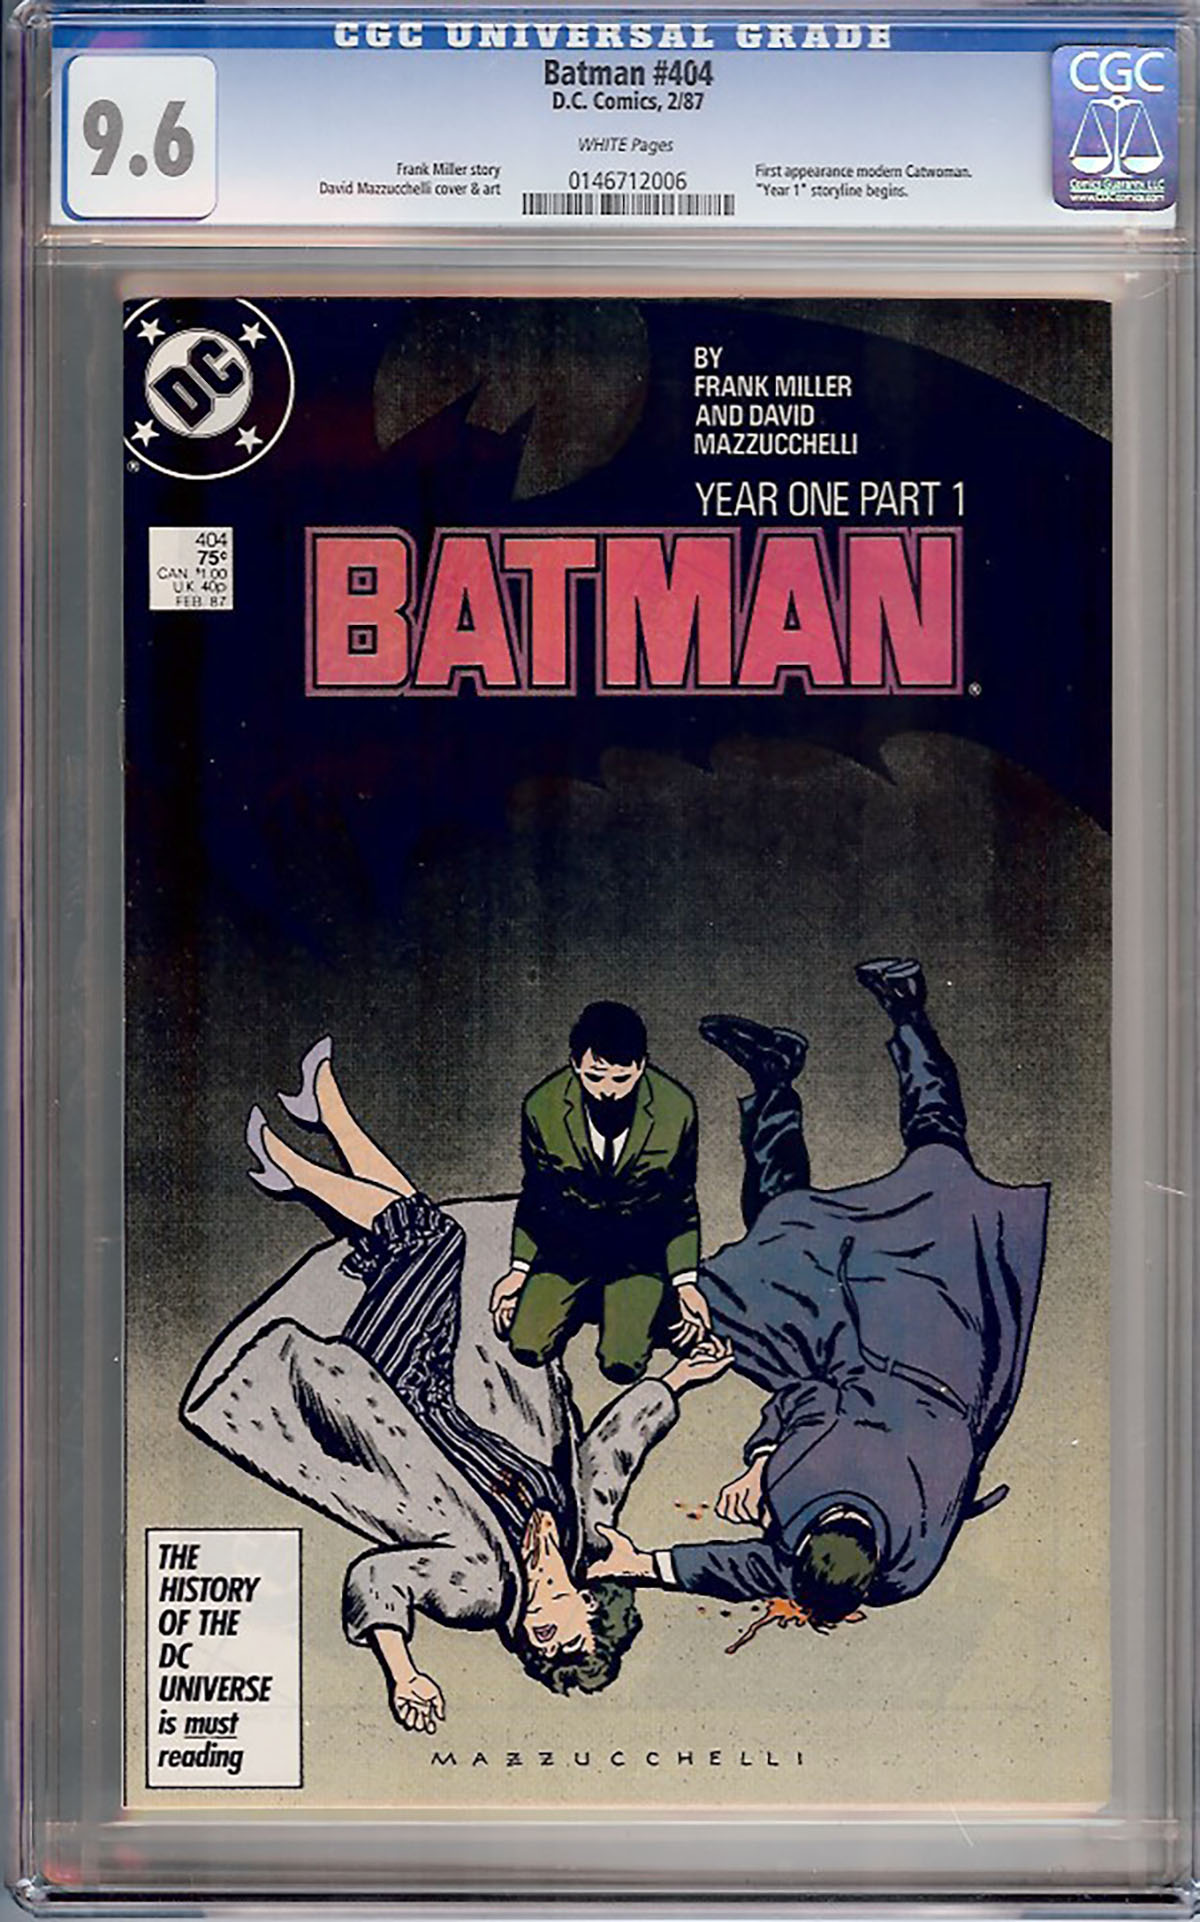 Batman #404 CGC 9.6 w